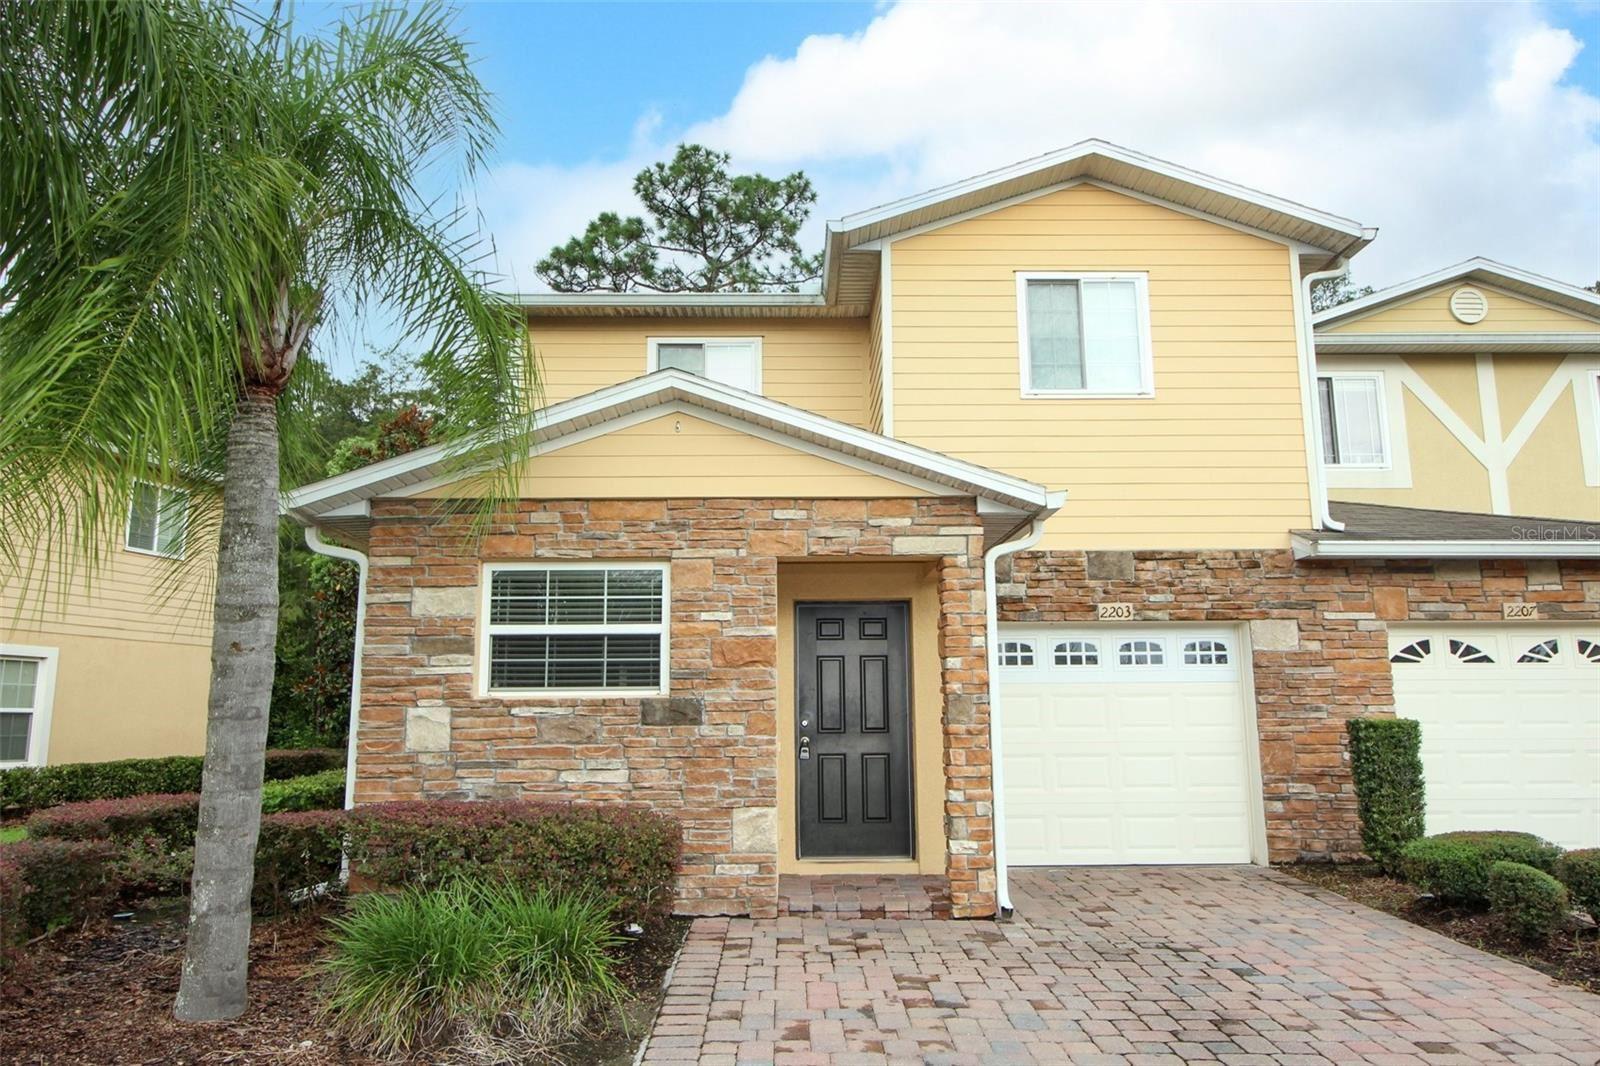 2203 CYPRESS VILLAS DRIVE, Orlando, FL 32825 - #: O5973538